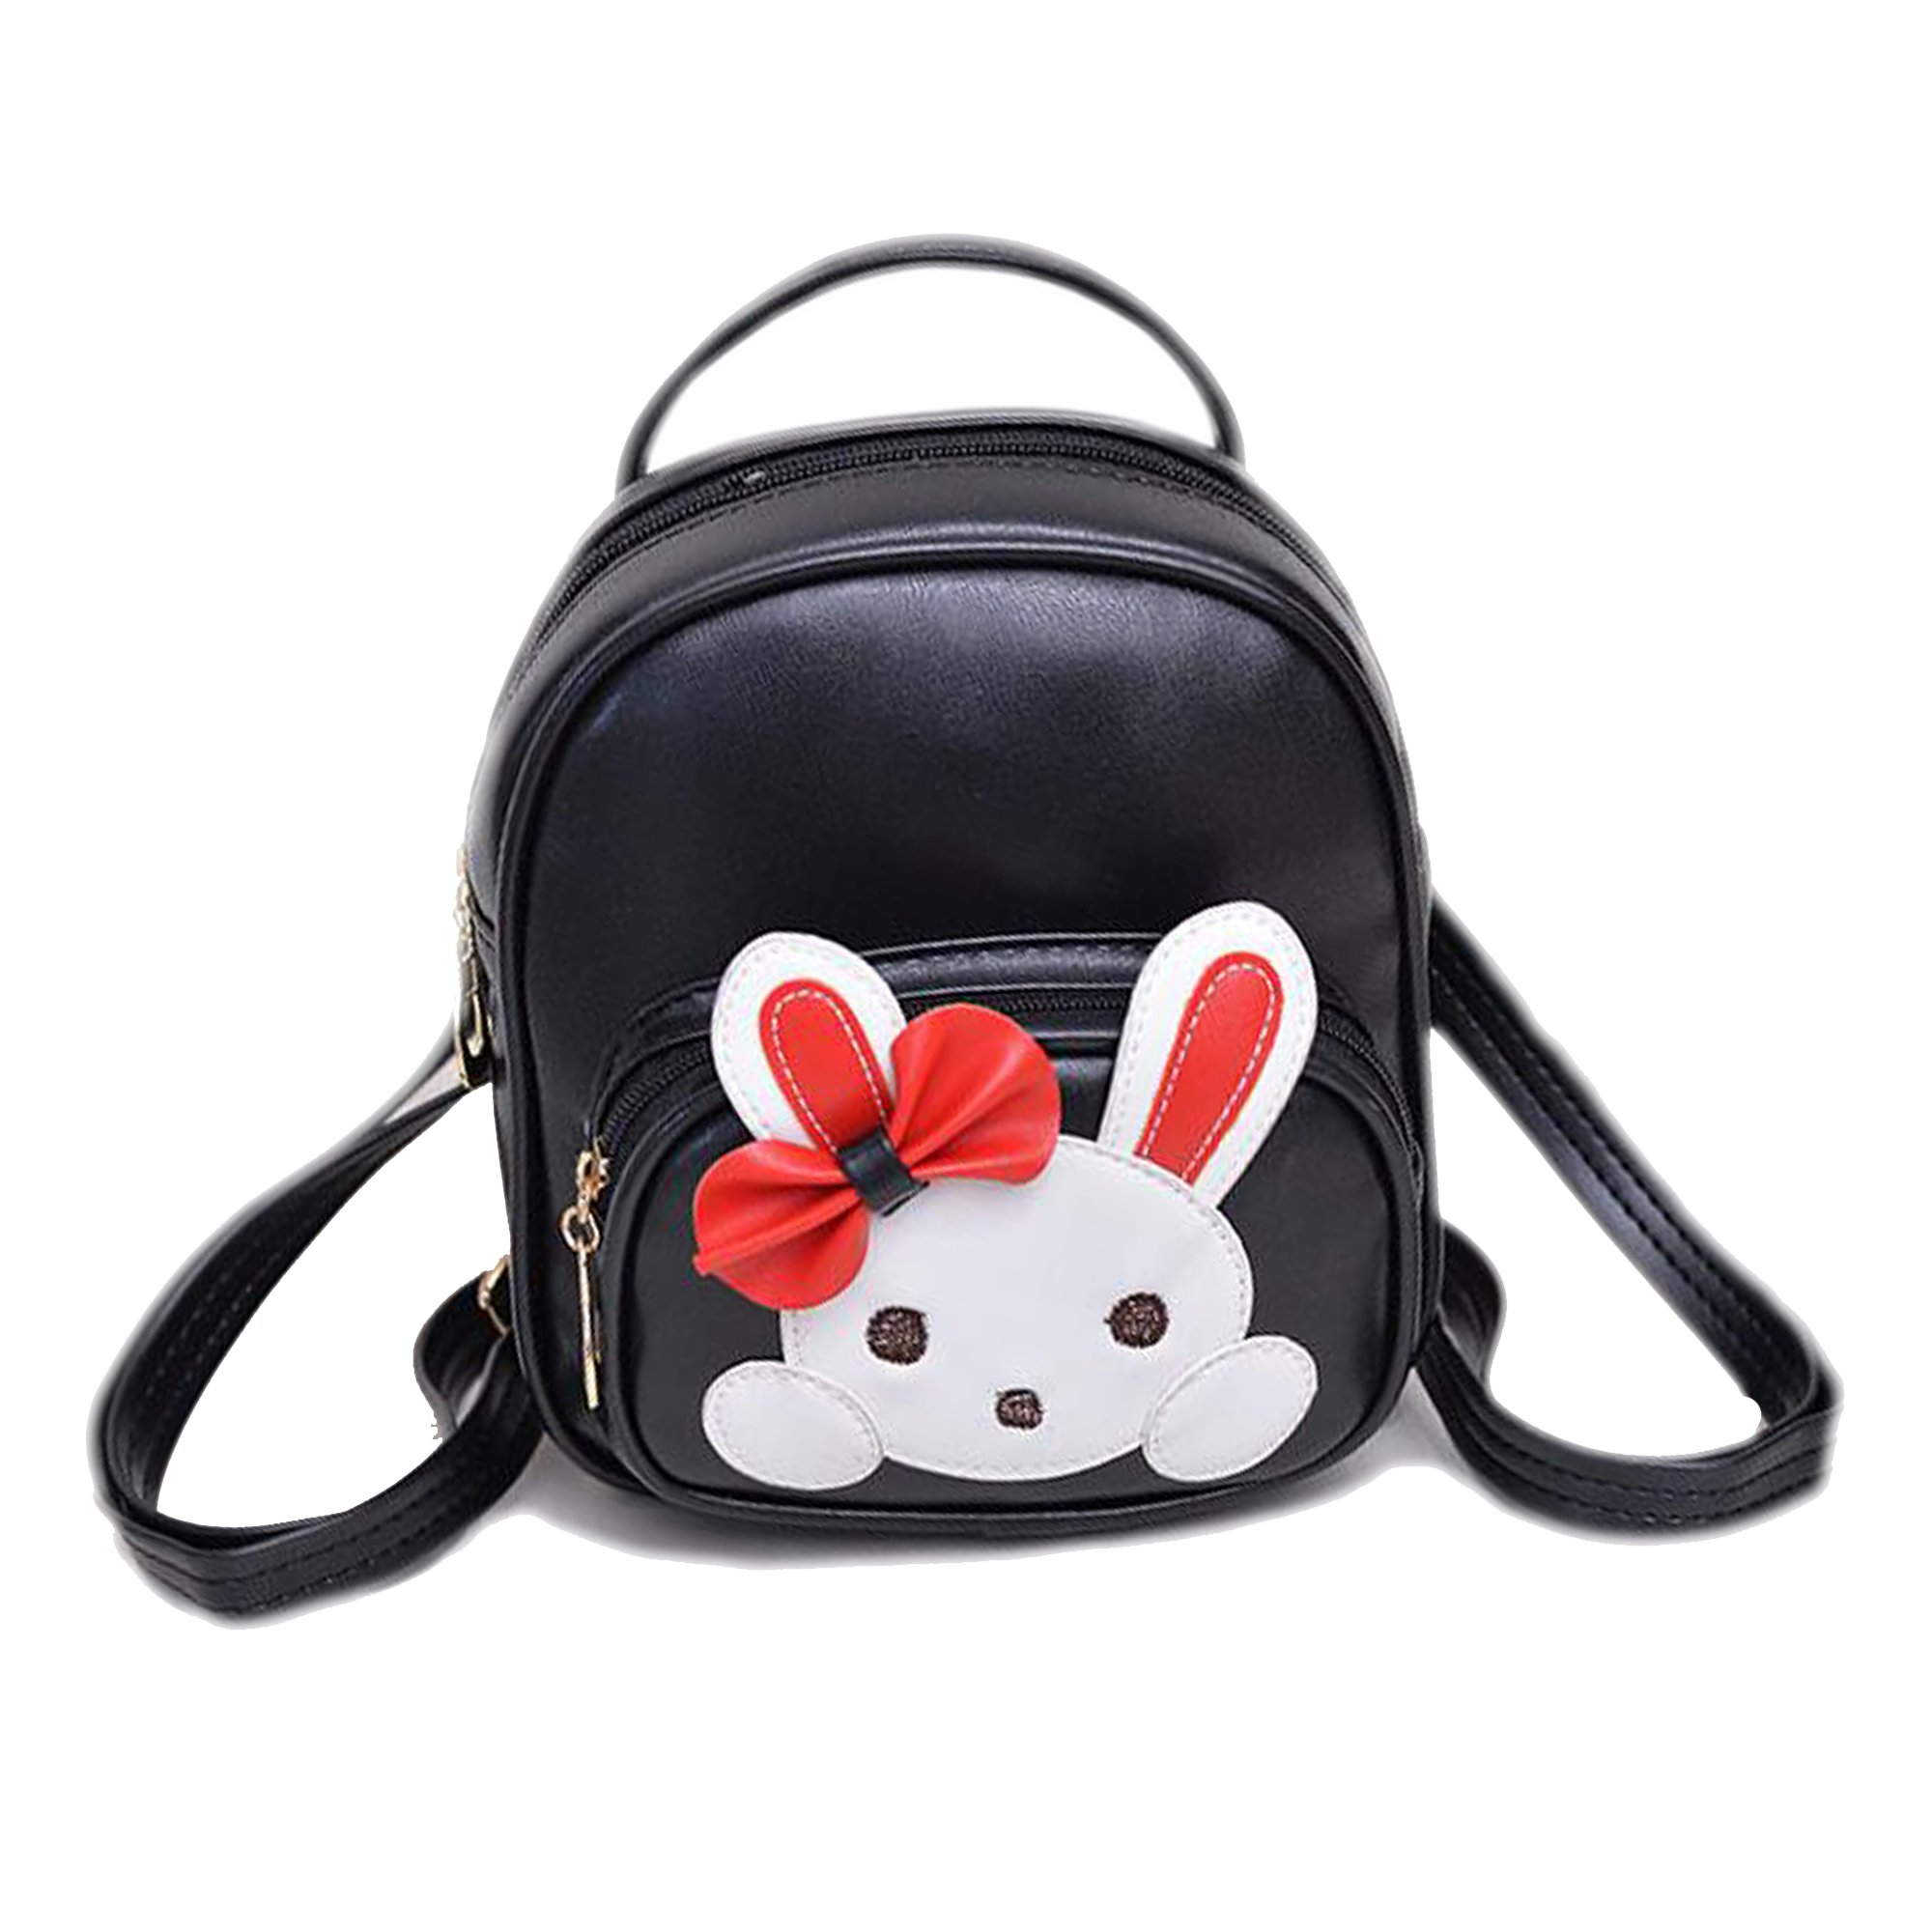 JIANBAO Girls Kids Rabbit Mini Backpack Travel School Book Bags Children Lovely Daypack Satchel (Black) by JIANBAO (Image #1)